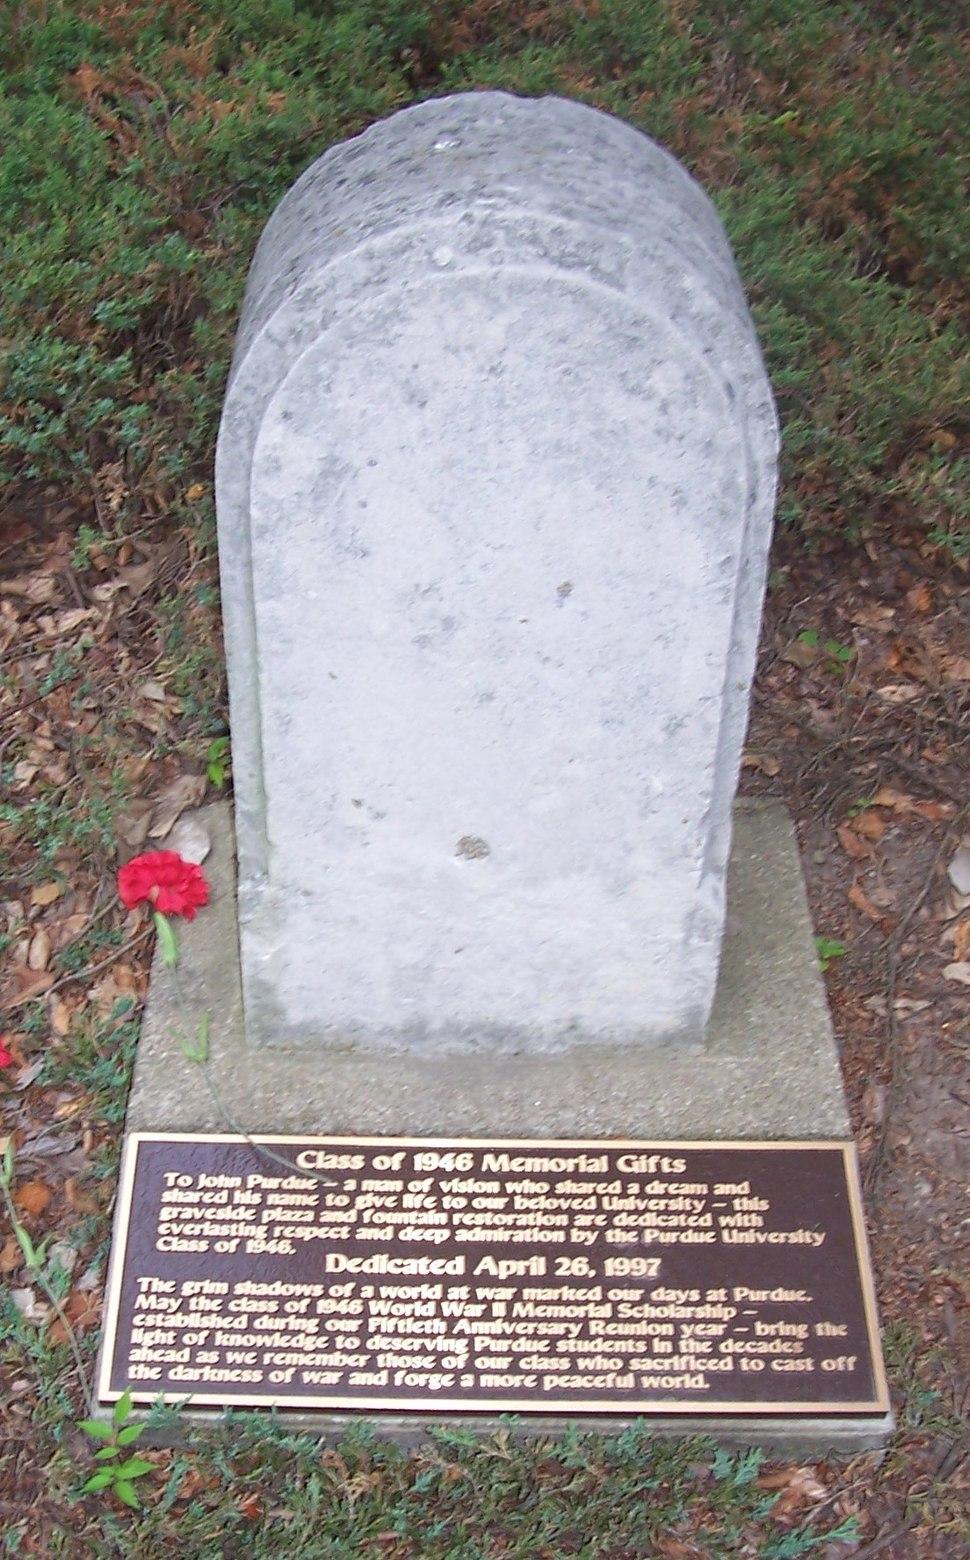 John purdue grave